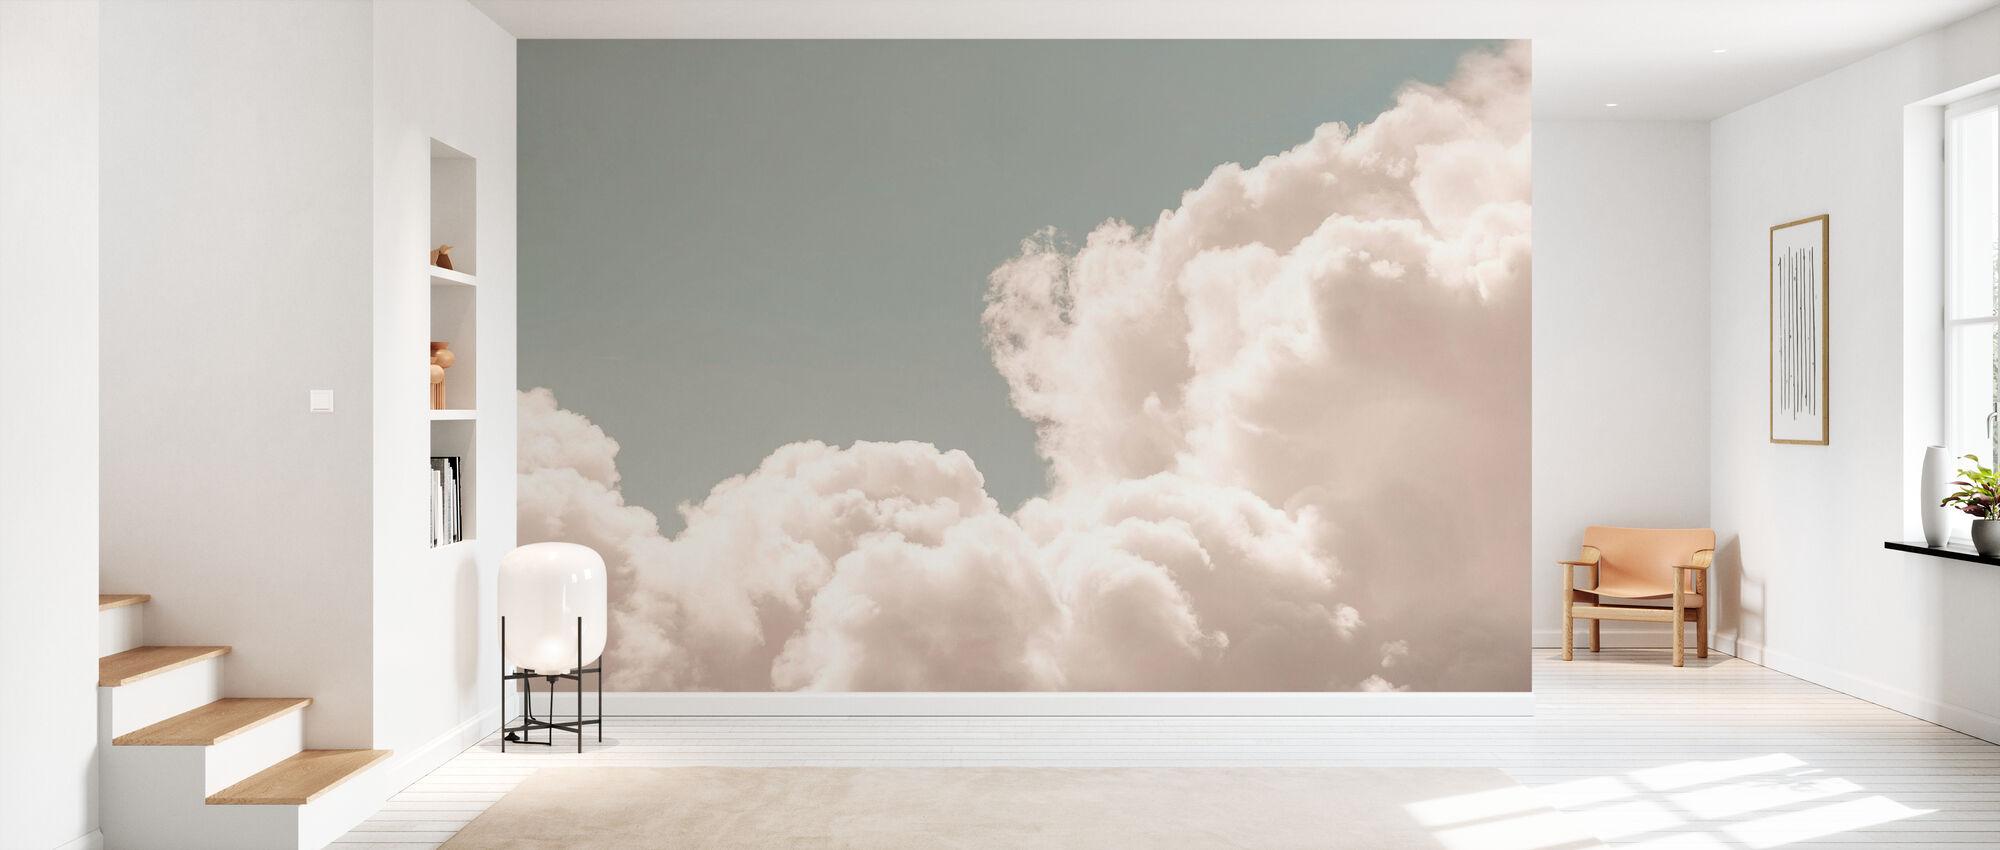 Blush Clouds Daydream - Wallpaper - Hallway